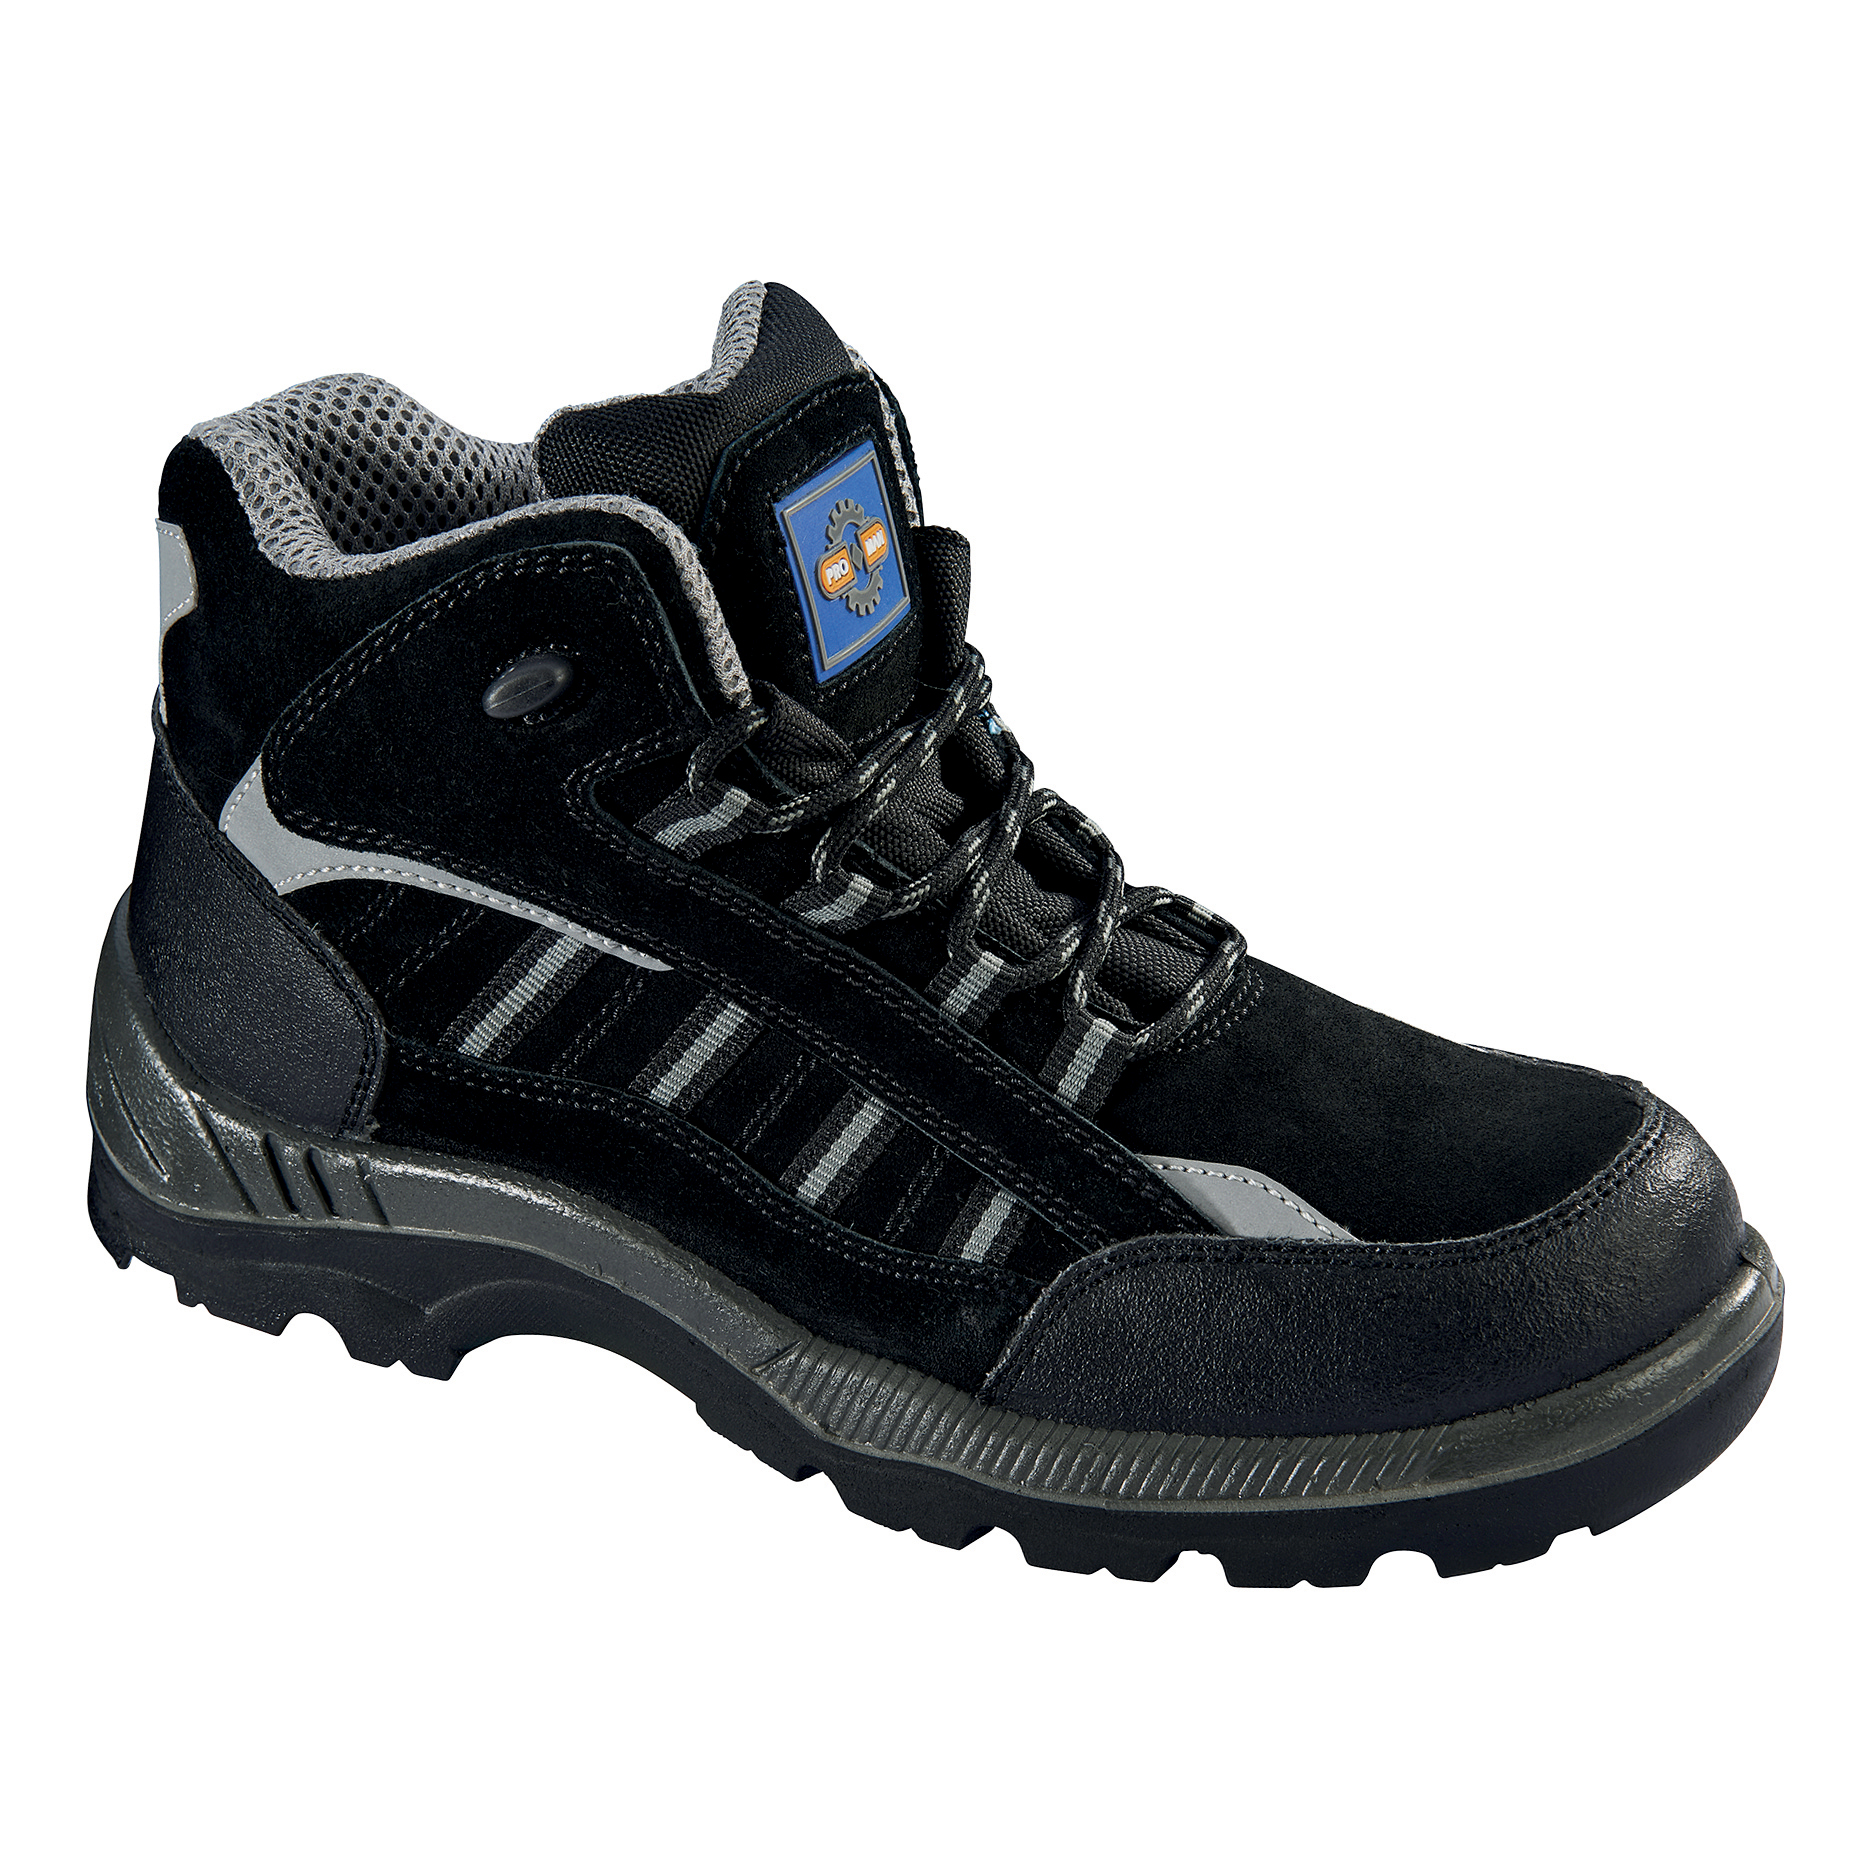 Rockfall ProMan Boot Suede Fibreglass Toecap Black Size 9 Ref PM4020 9